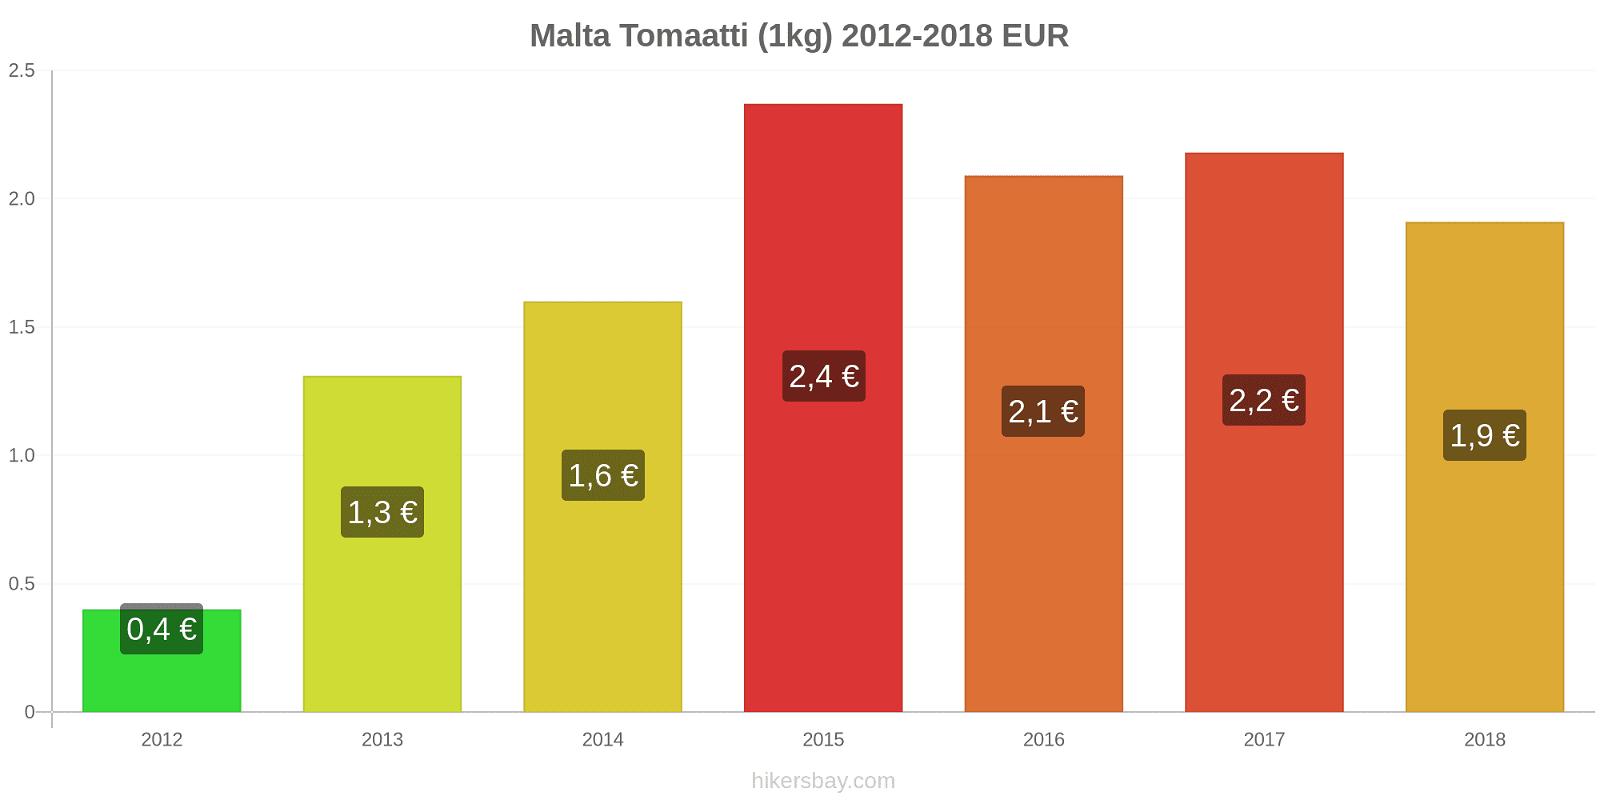 Malta hintojen muutokset Tomaatti (1kg) hikersbay.com